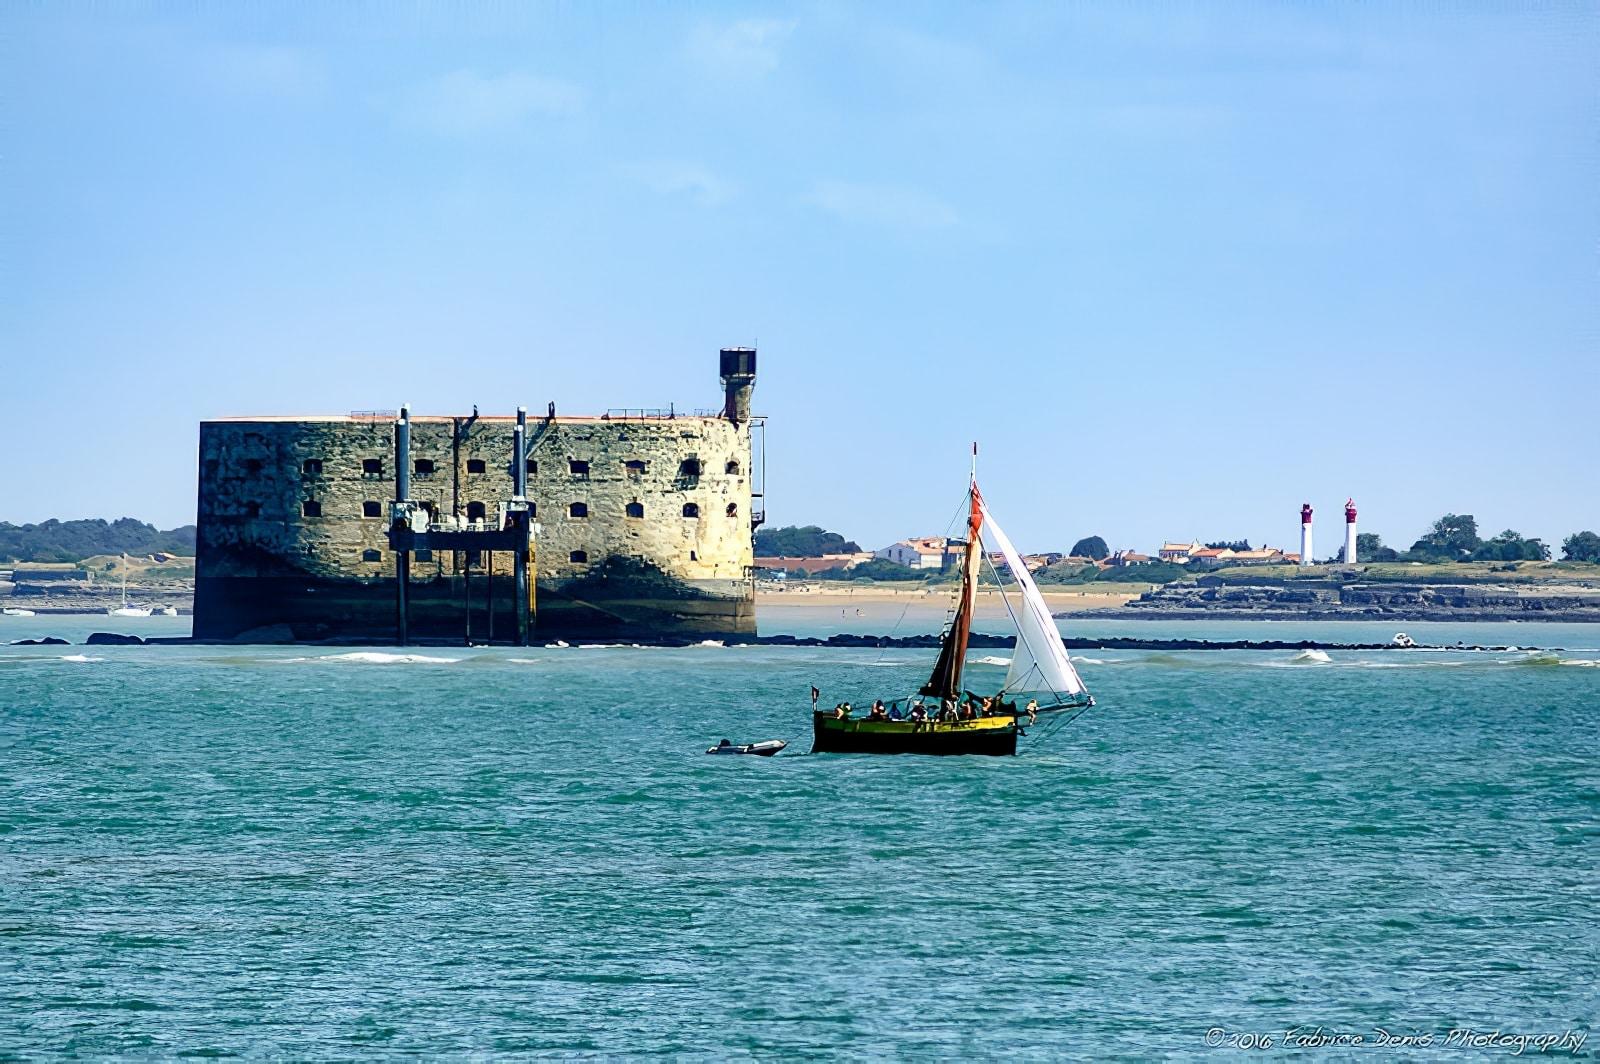 Fort Boyard, Saint-Georges d'Oléron